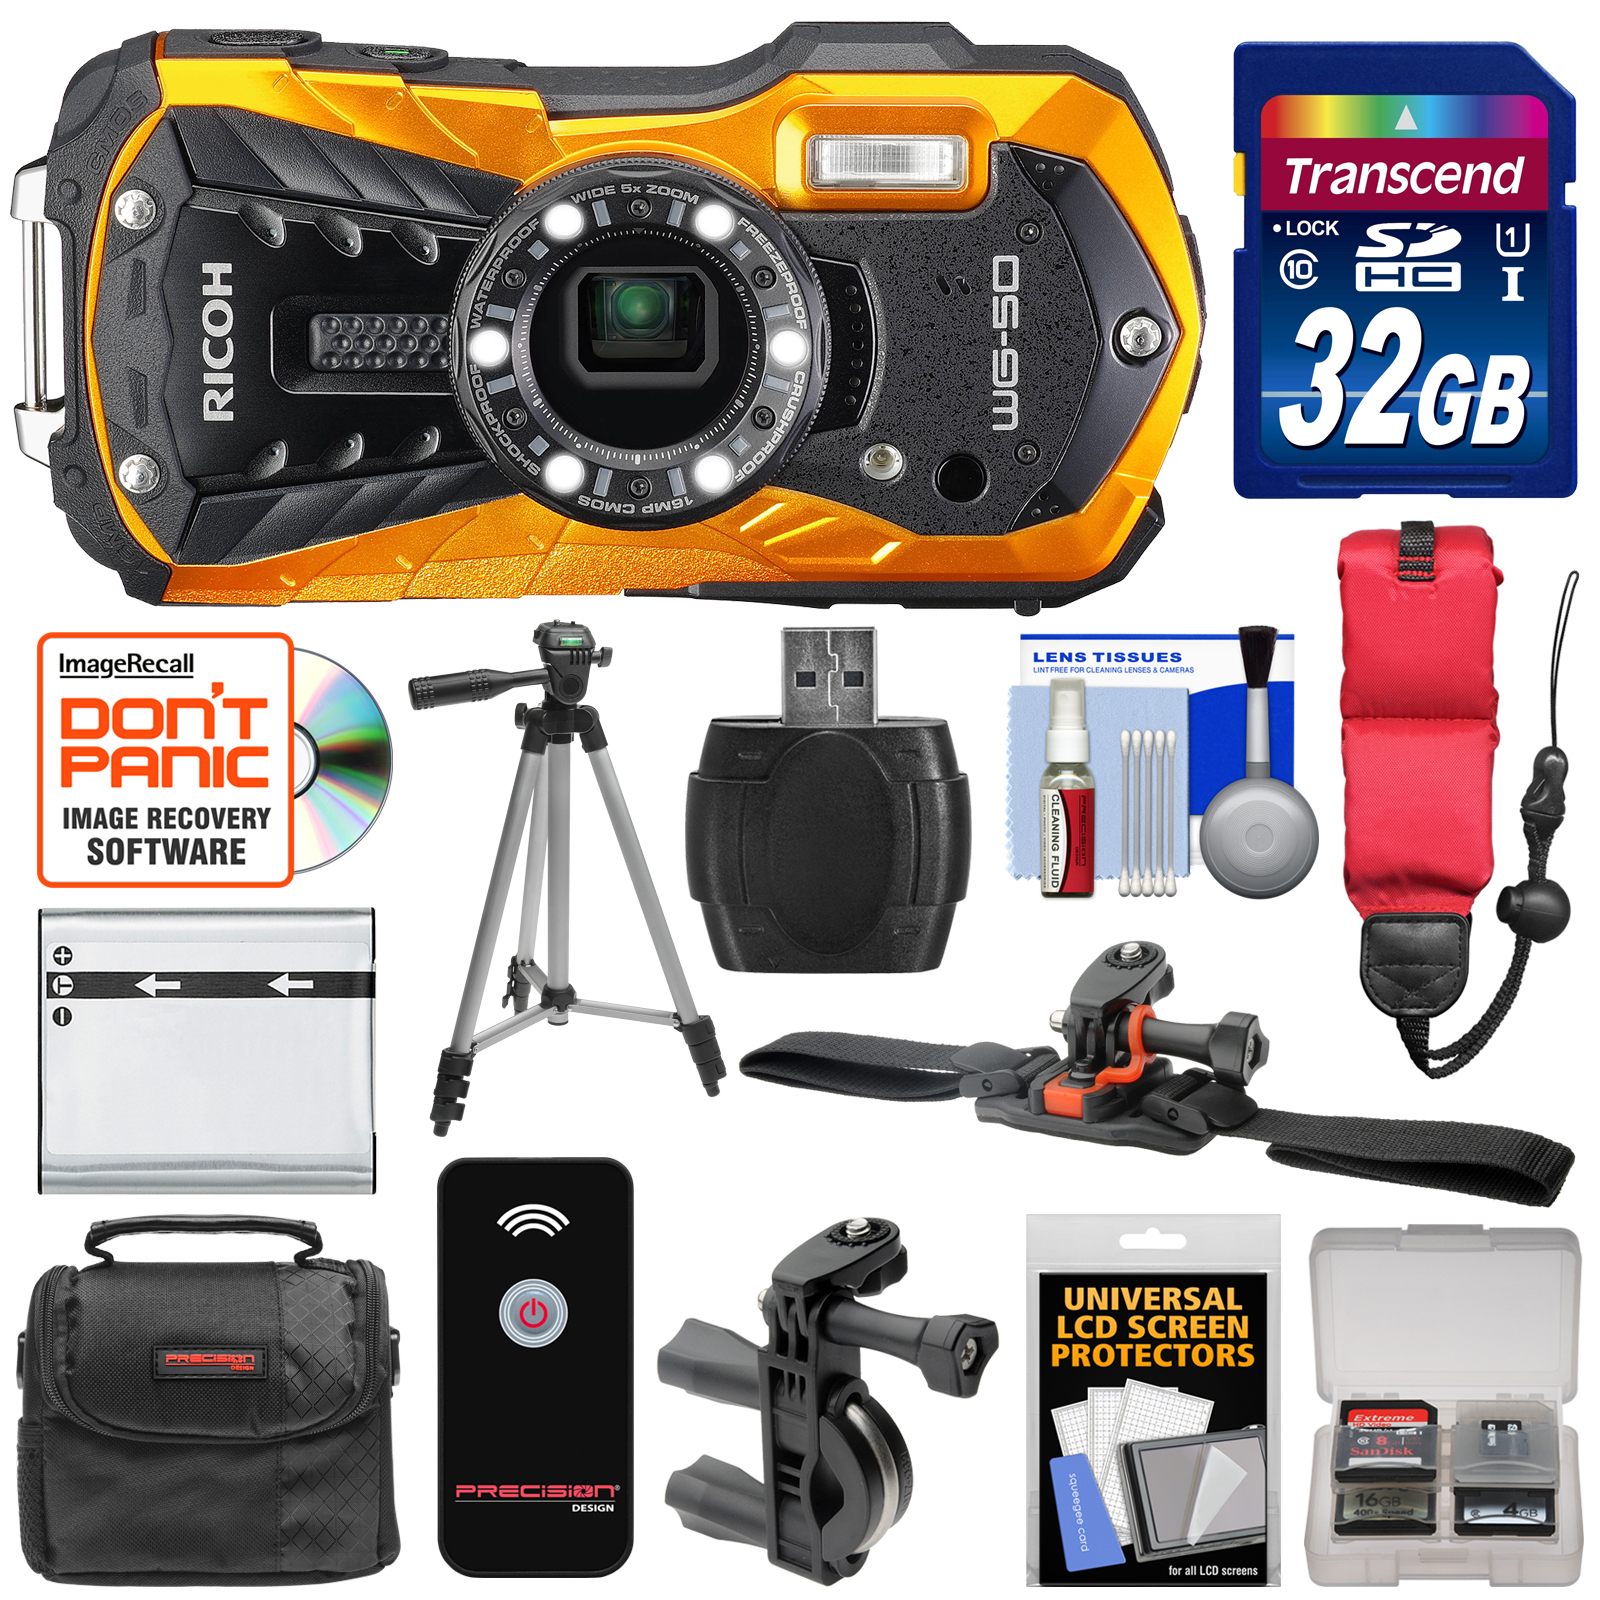 Ricoh WG-50 Waterproof / Shockproof Digital Camera (Carbon Grey) with 32GB Card + Helmet & Bike Mounts + Battery + Case + Tripod + Strap Kit